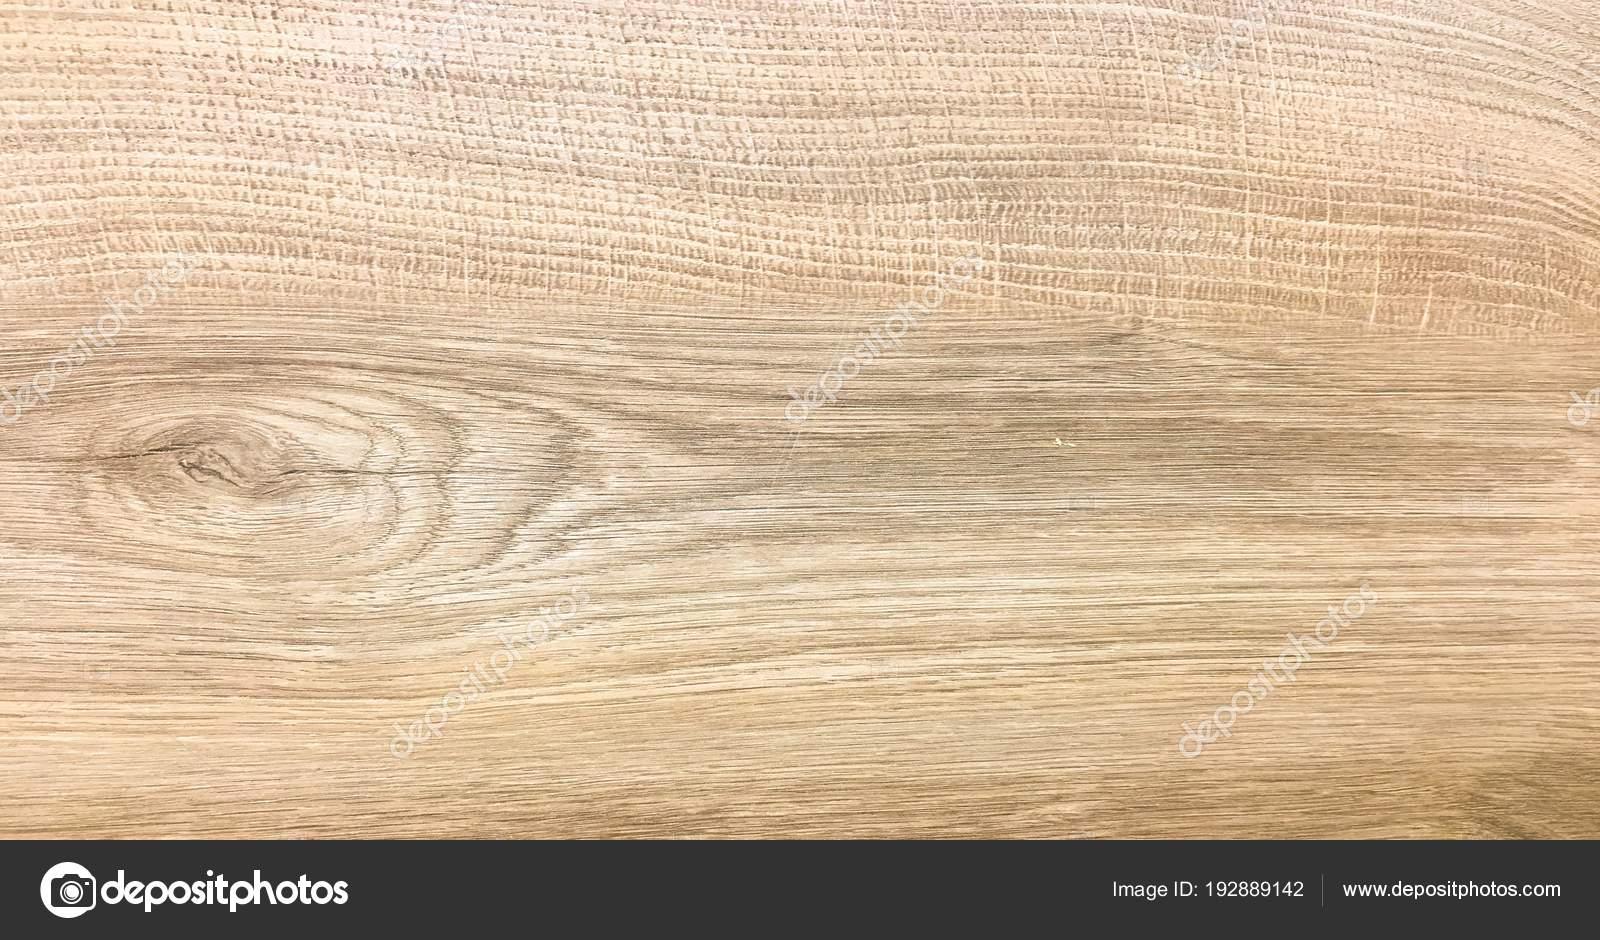 https fr depositphotos com 192889142 stock photo wood texture background light oak html